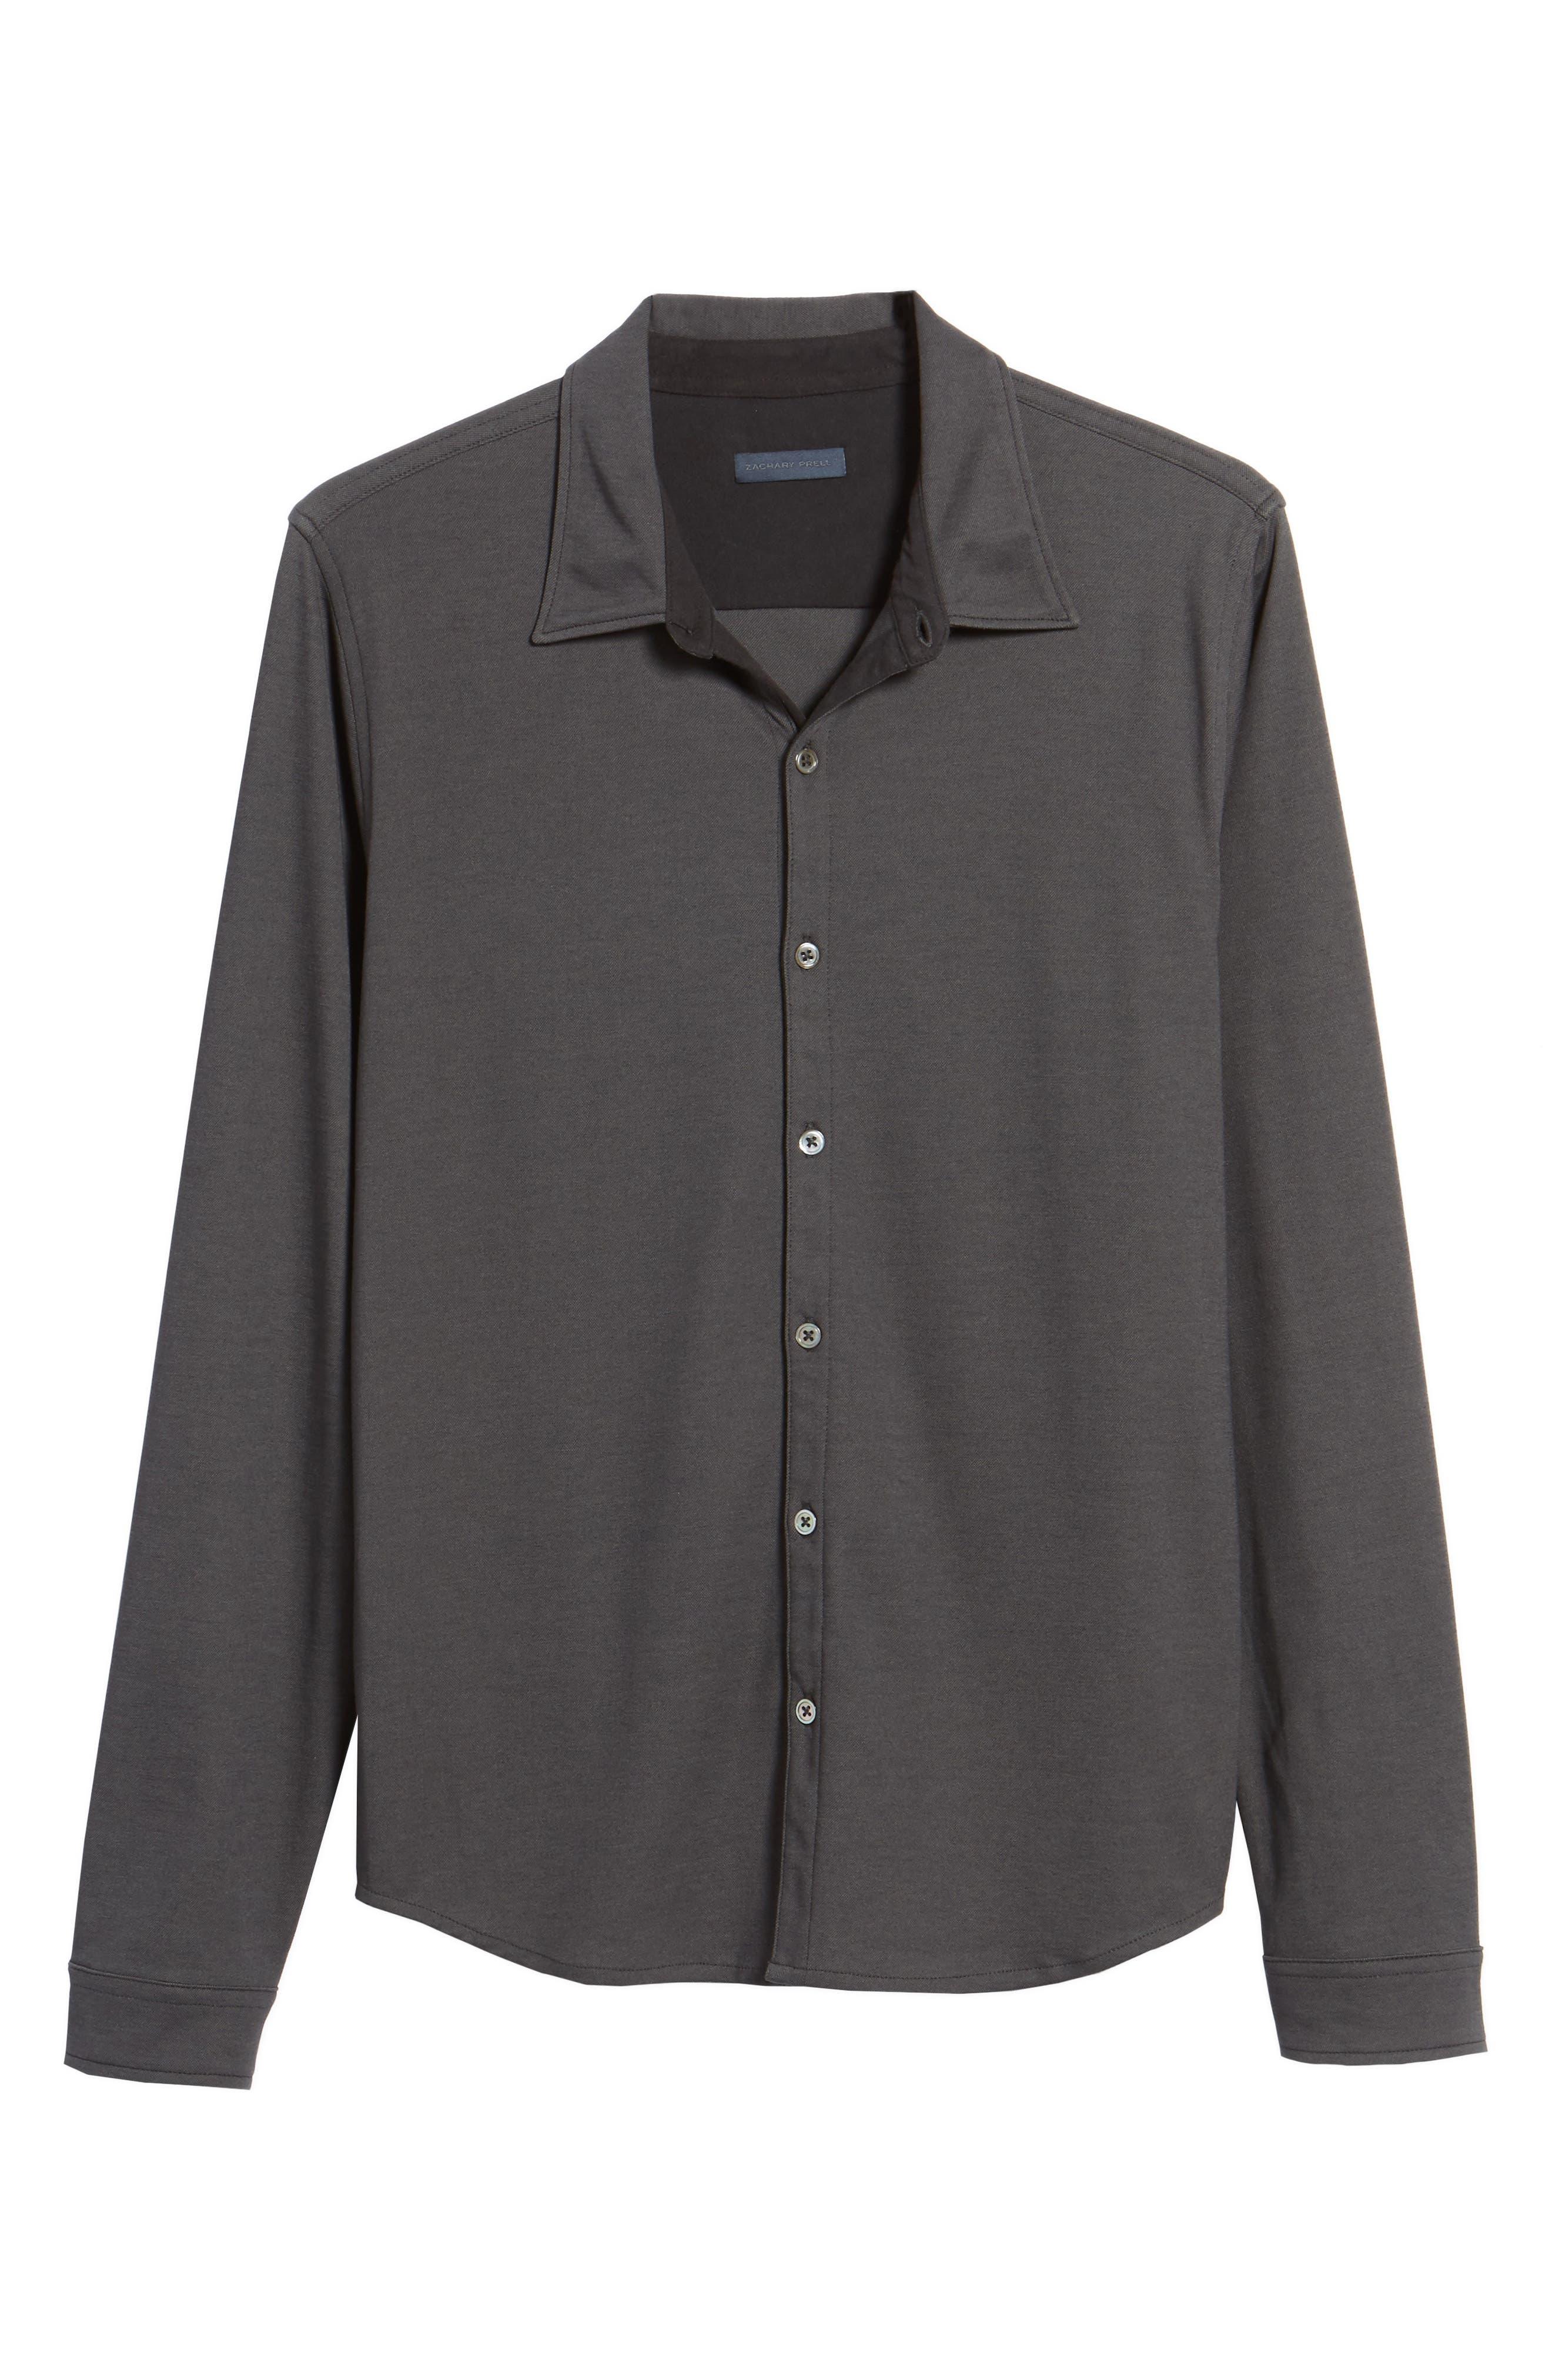 Glacier Knit Sport Shirt,                             Alternate thumbnail 6, color,                             001